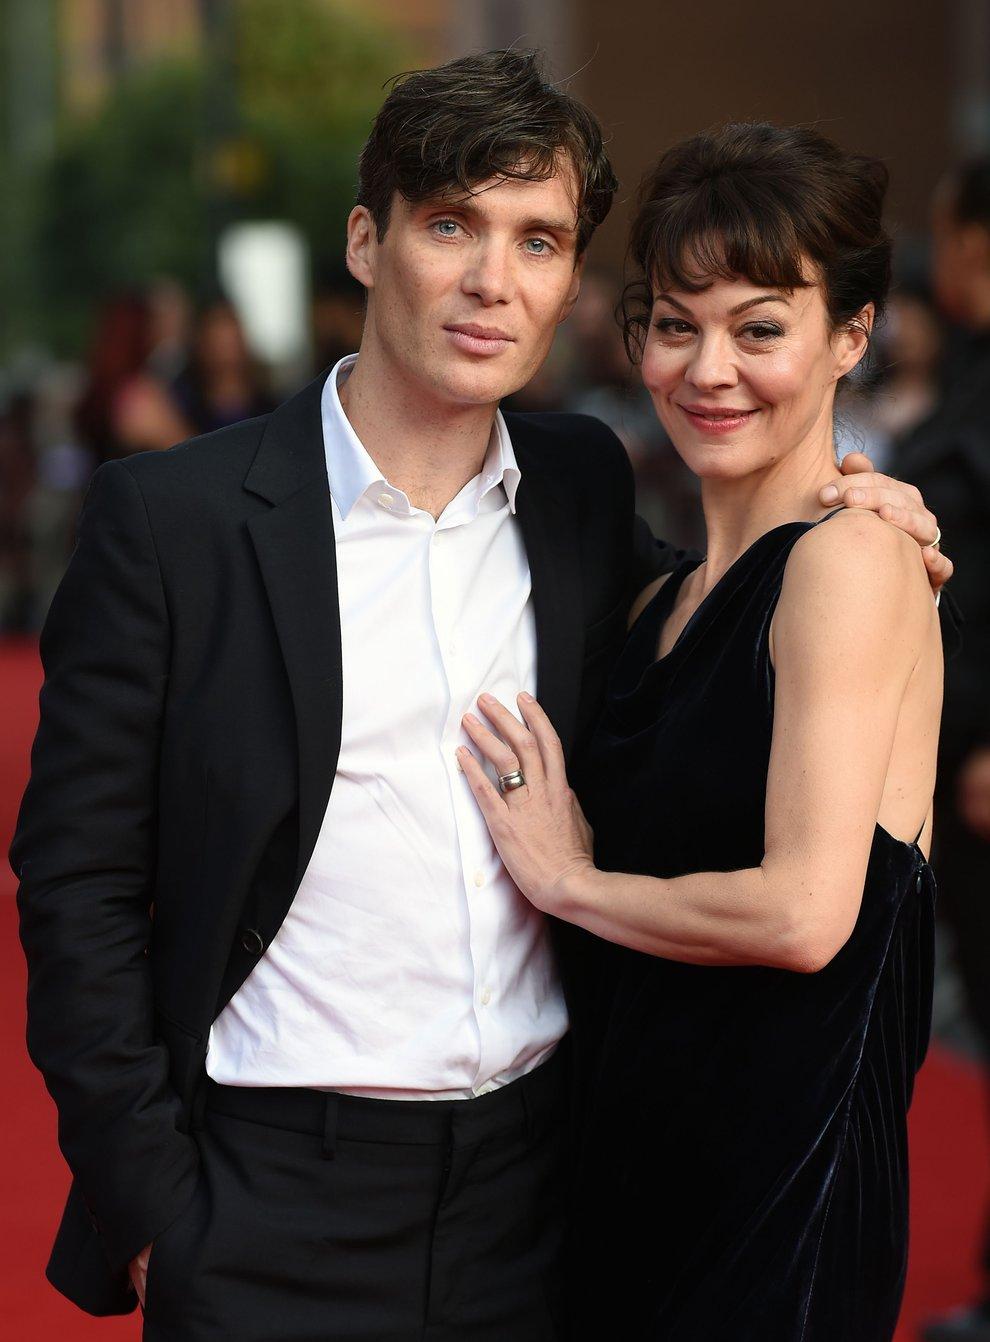 Cillian Murphy and Helen McCrory